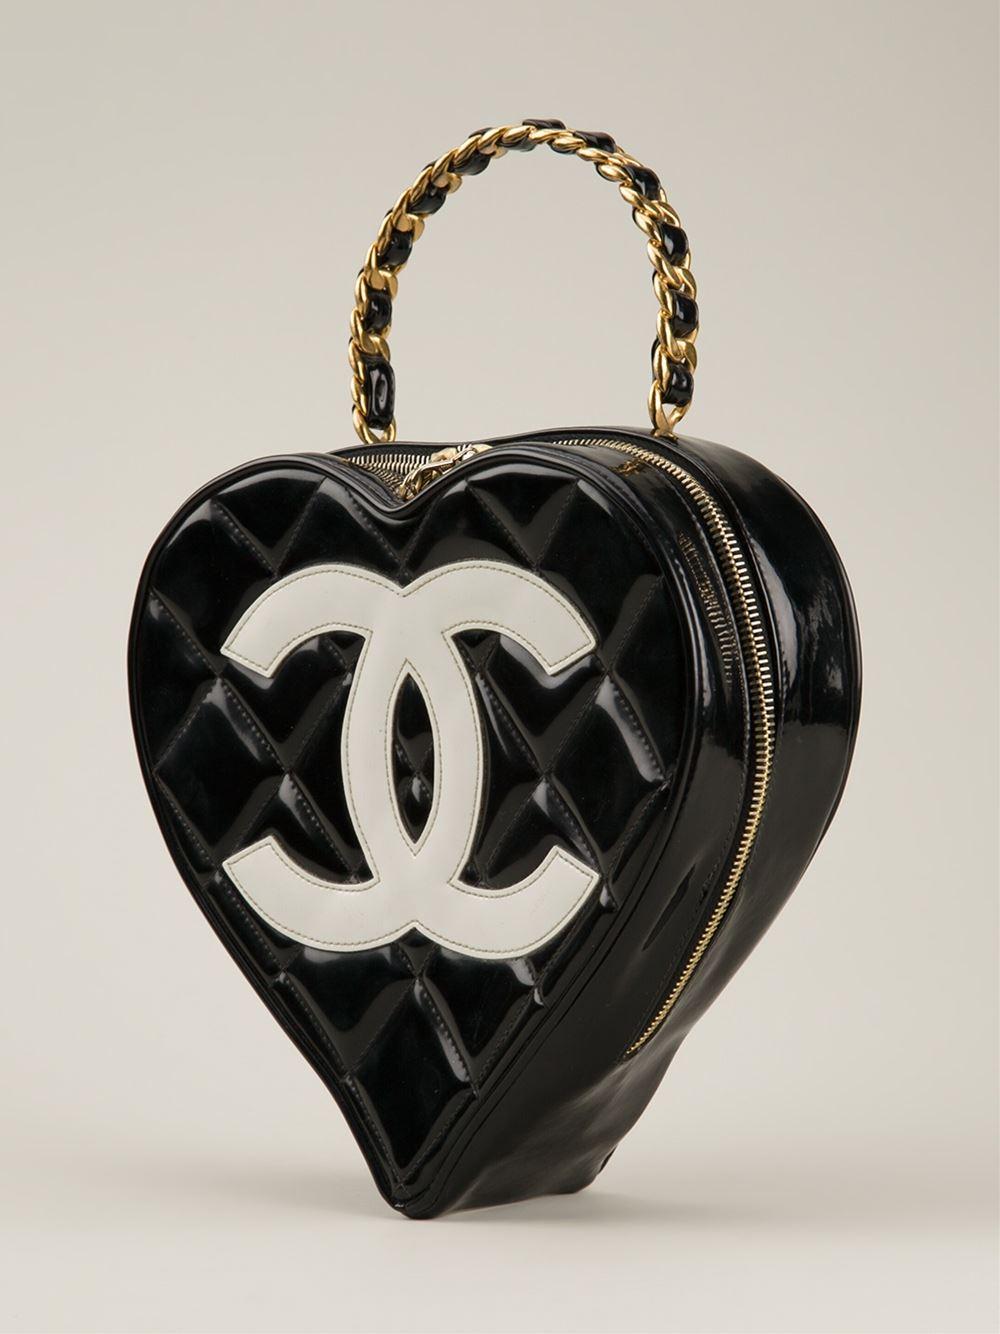 cb23eba142d3 Splurge du Jour  Chanel Vintage Heart Shaped Tote - Handbag du Jour ...